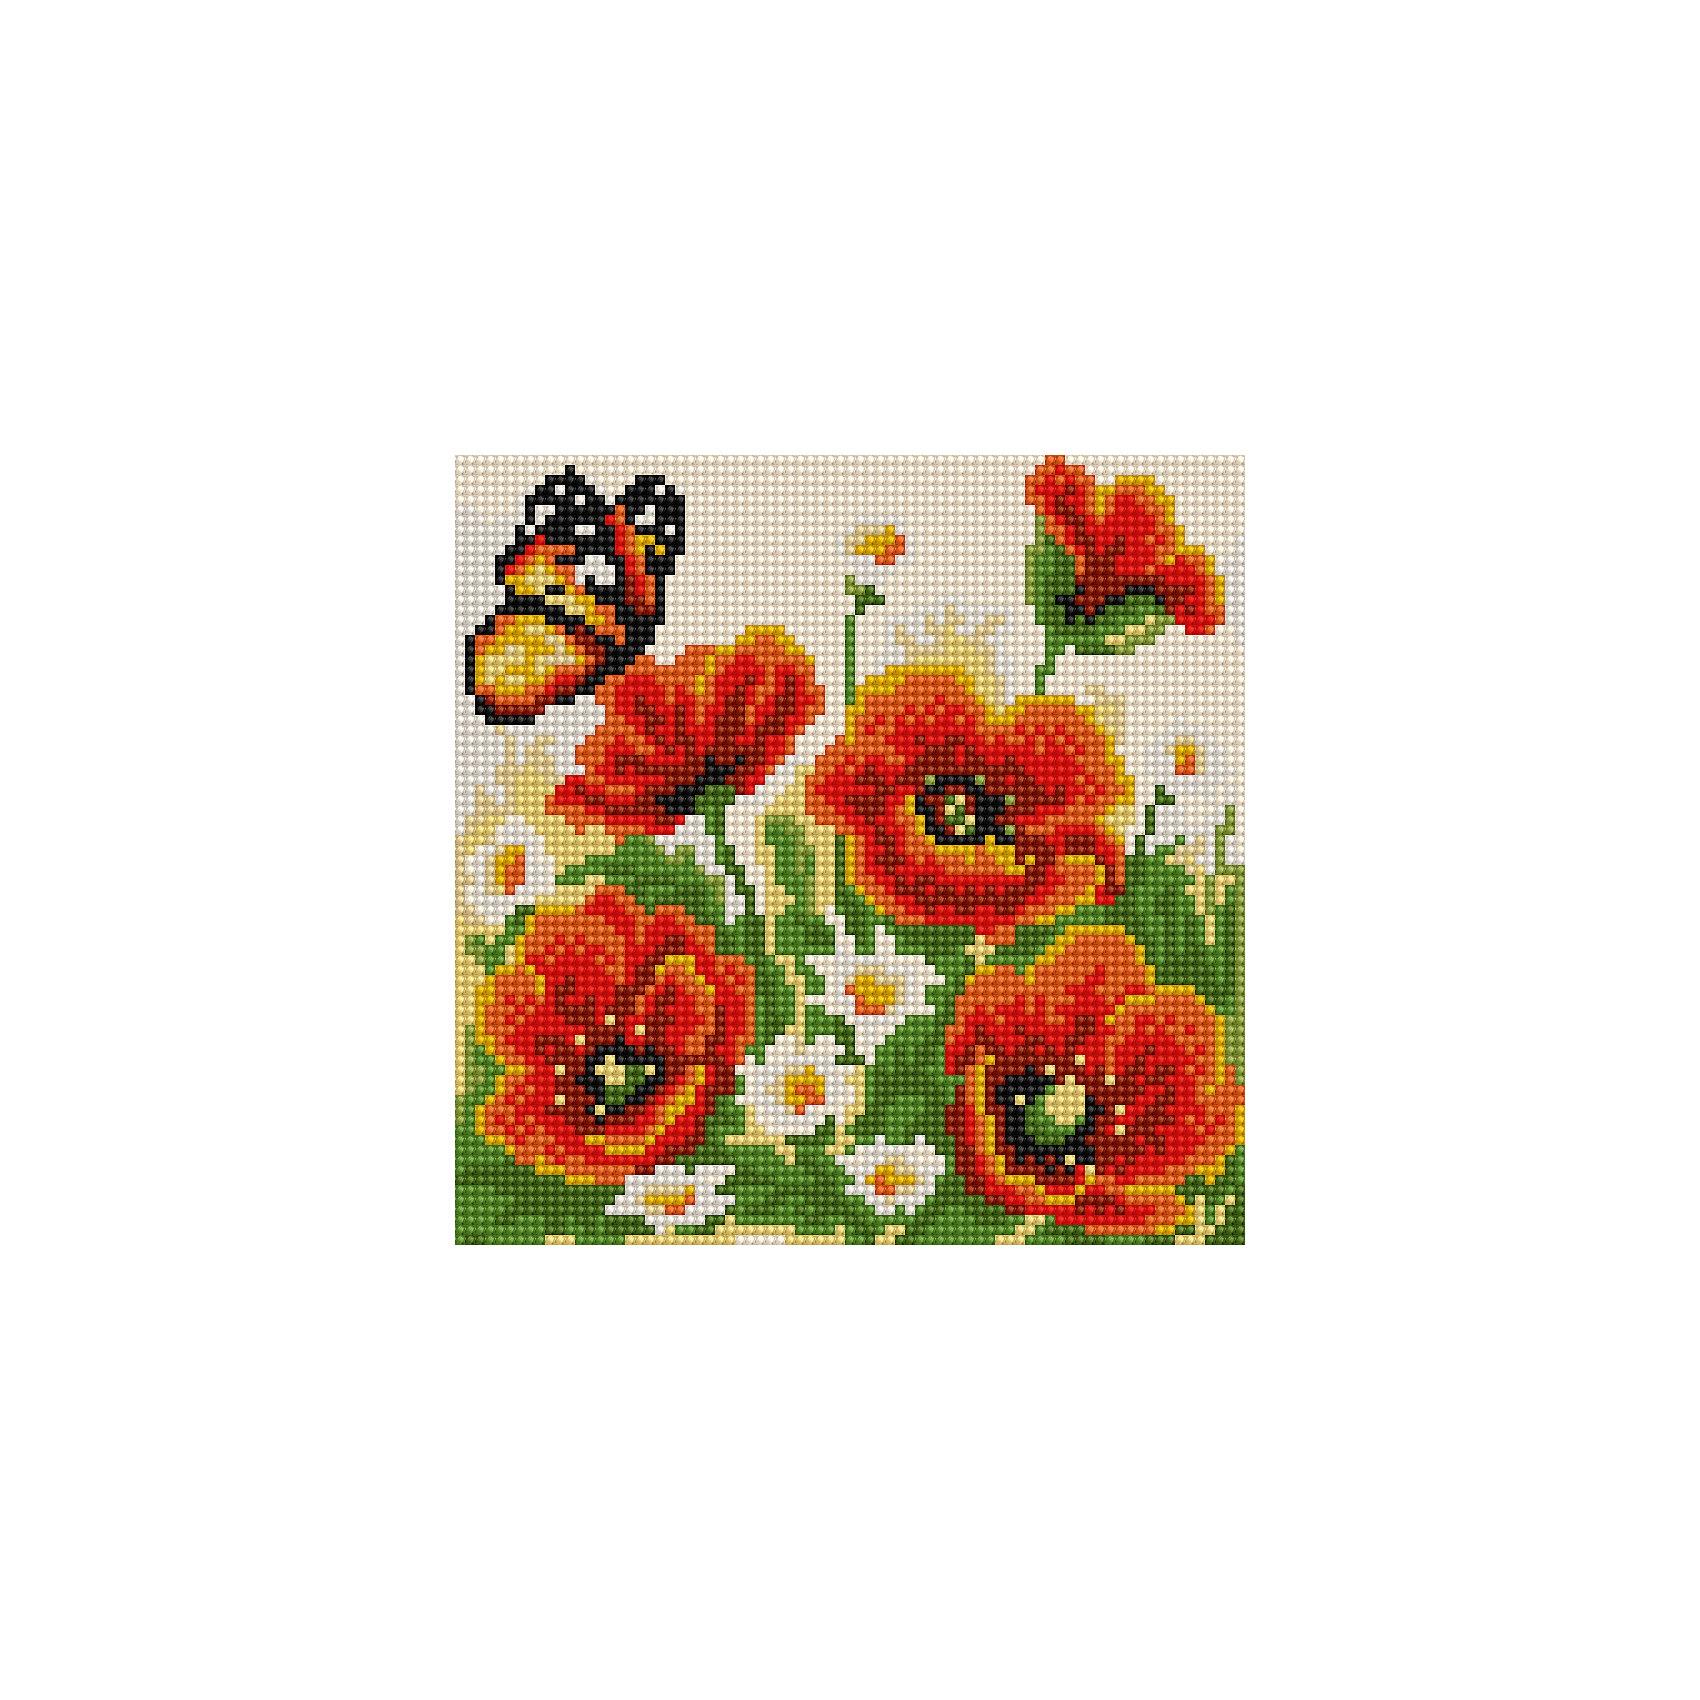 Schreiber Алмазная мозаика по номерами Маки и бабочка 20*20 см